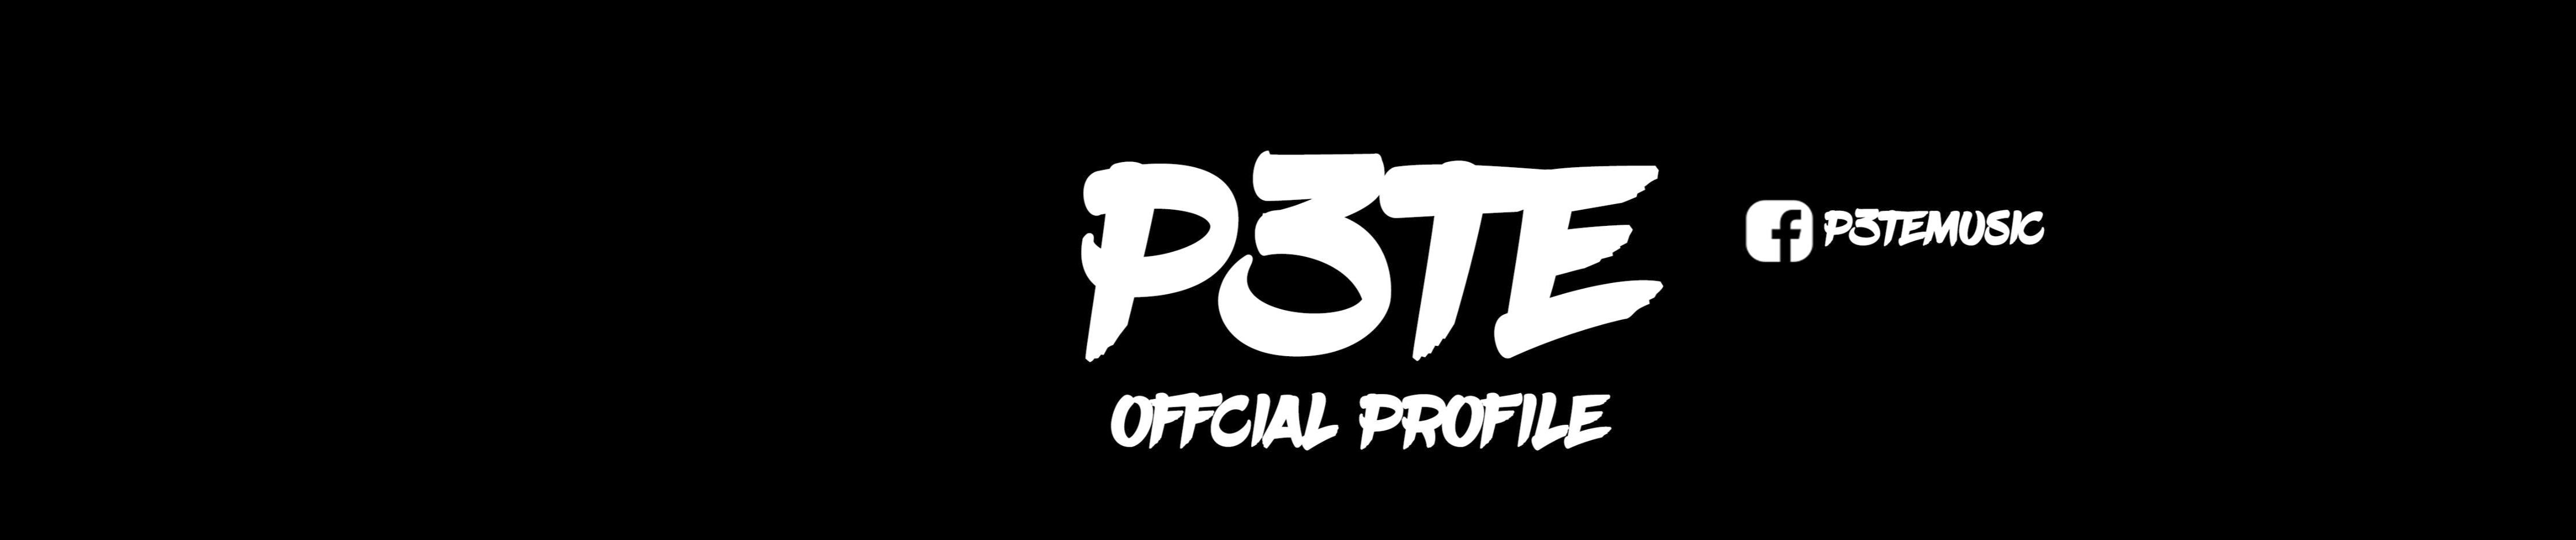 P3TE - HANDS UP (Original Mix)